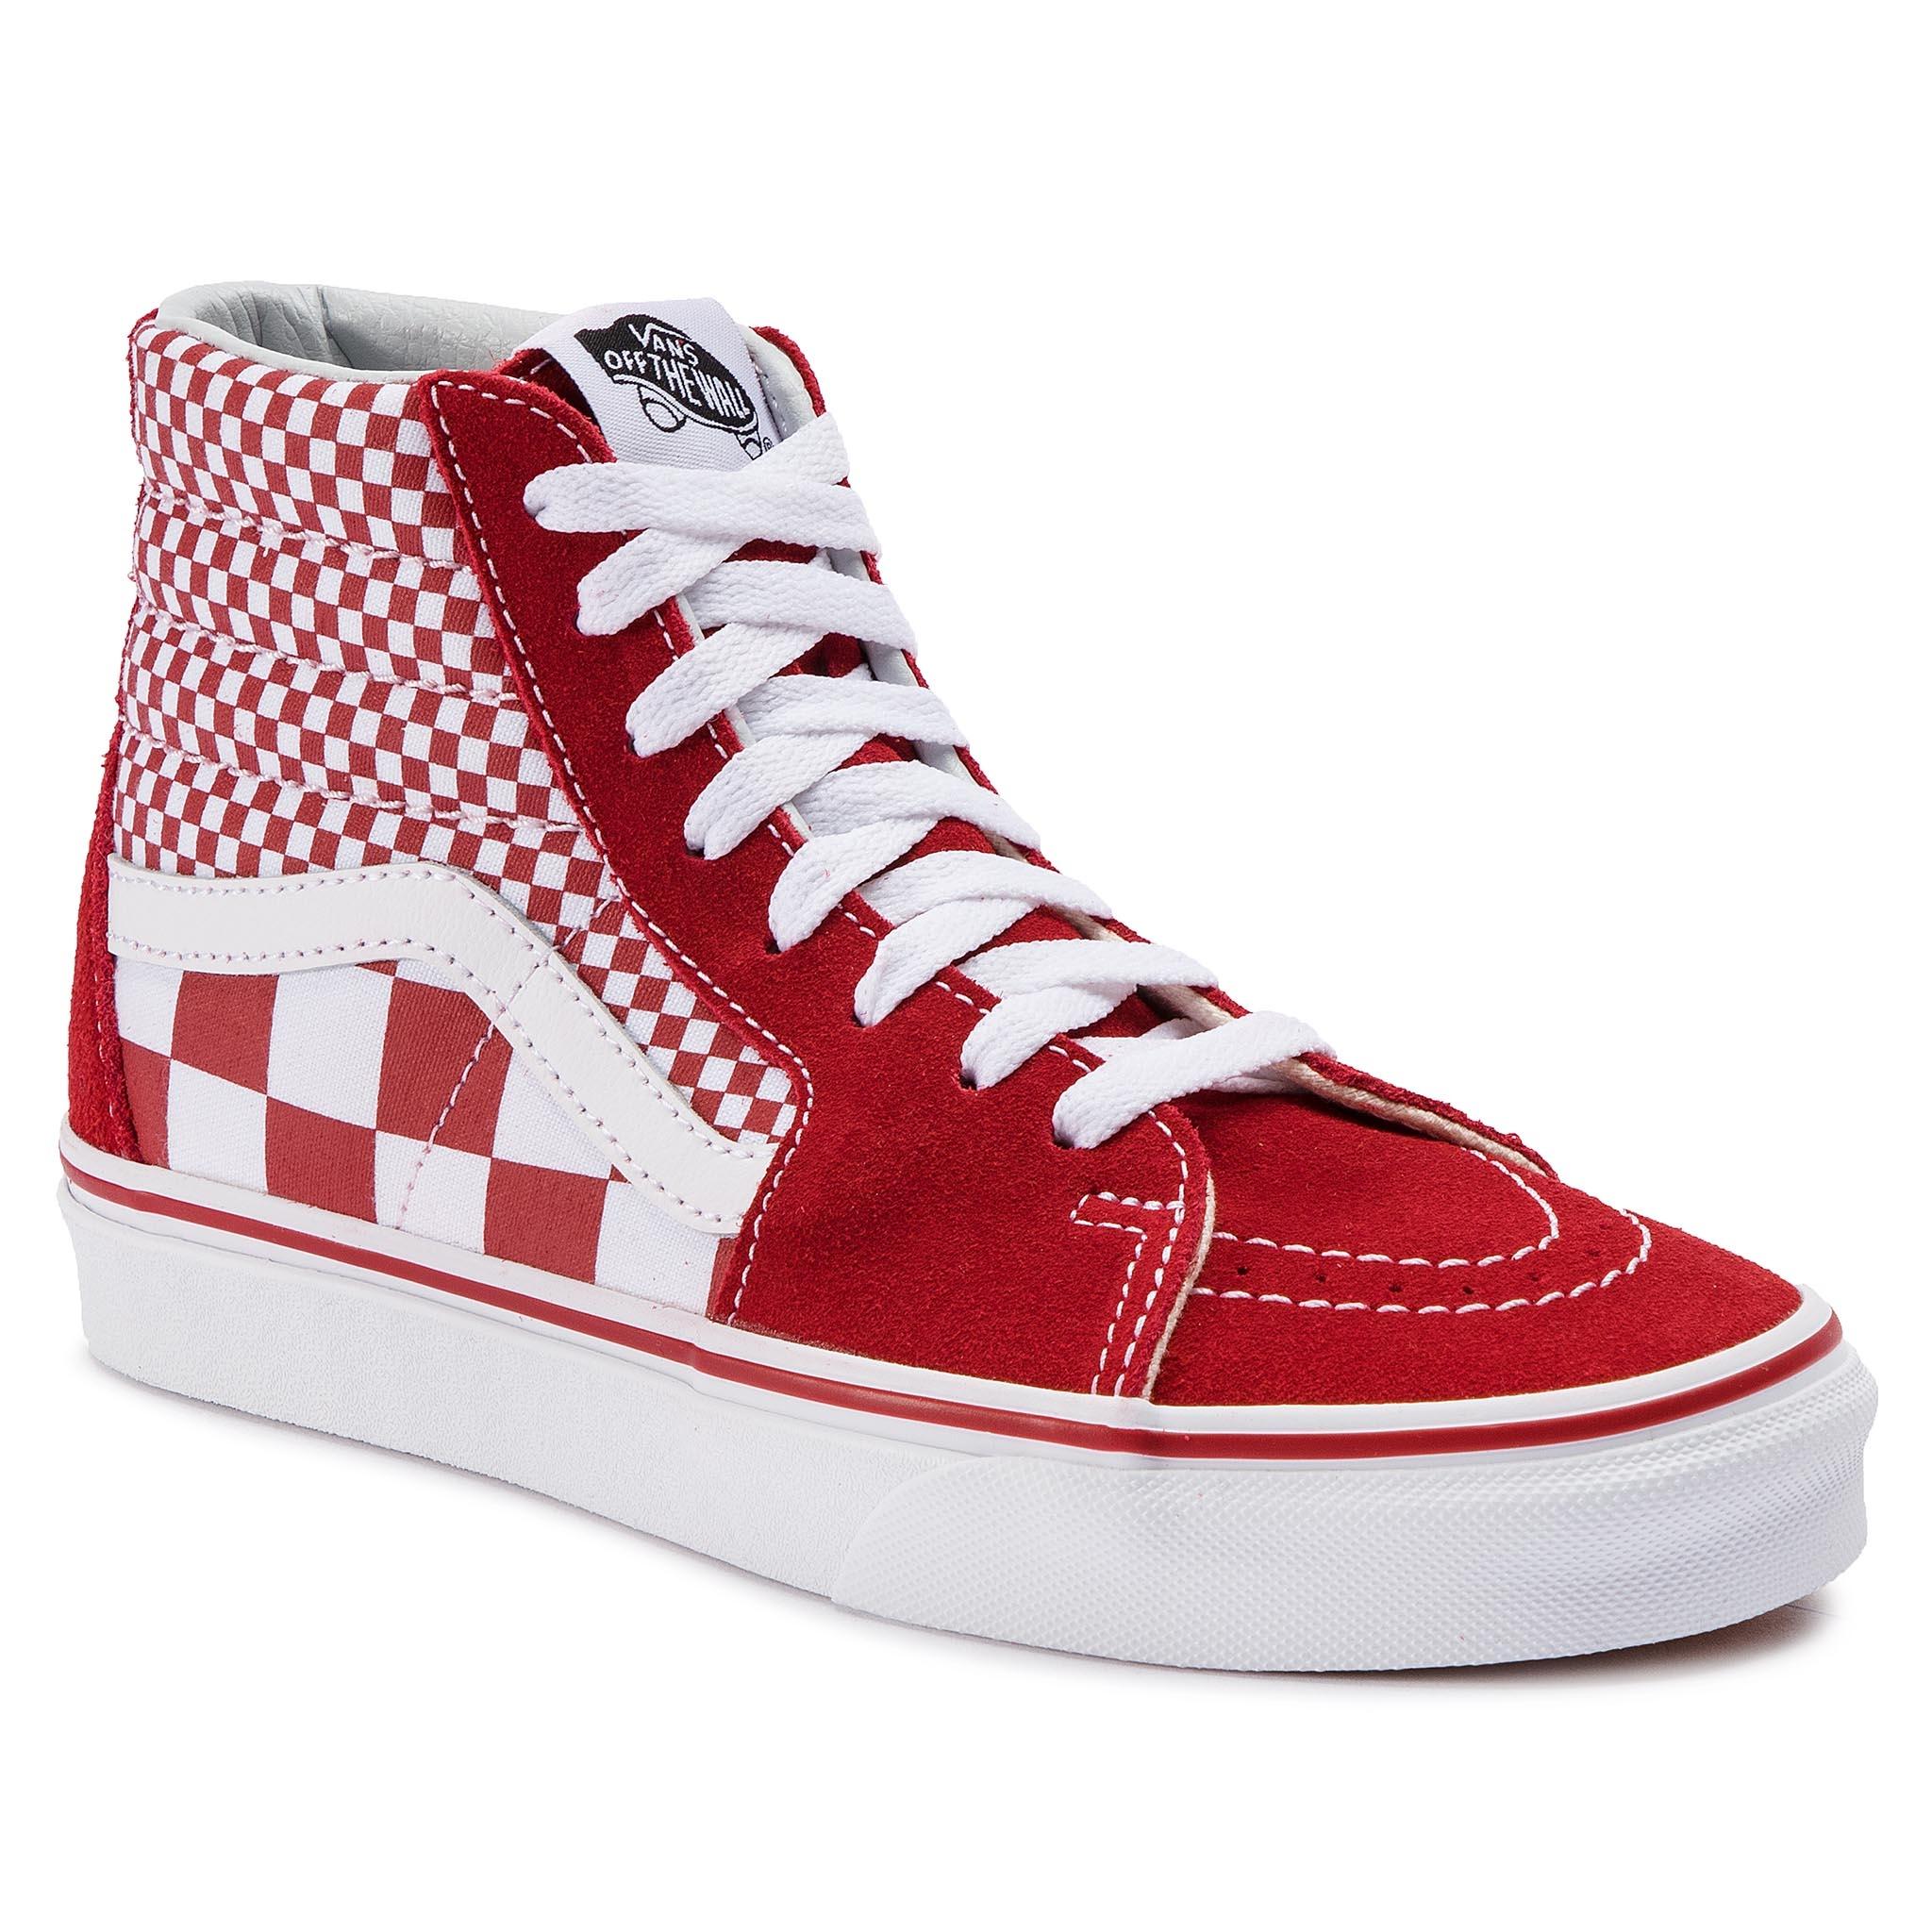 92a8a21313 Sneakers VANS Sk8-Hi VN0A38GEVK51 (Mix Checker) CHili Pepper True White